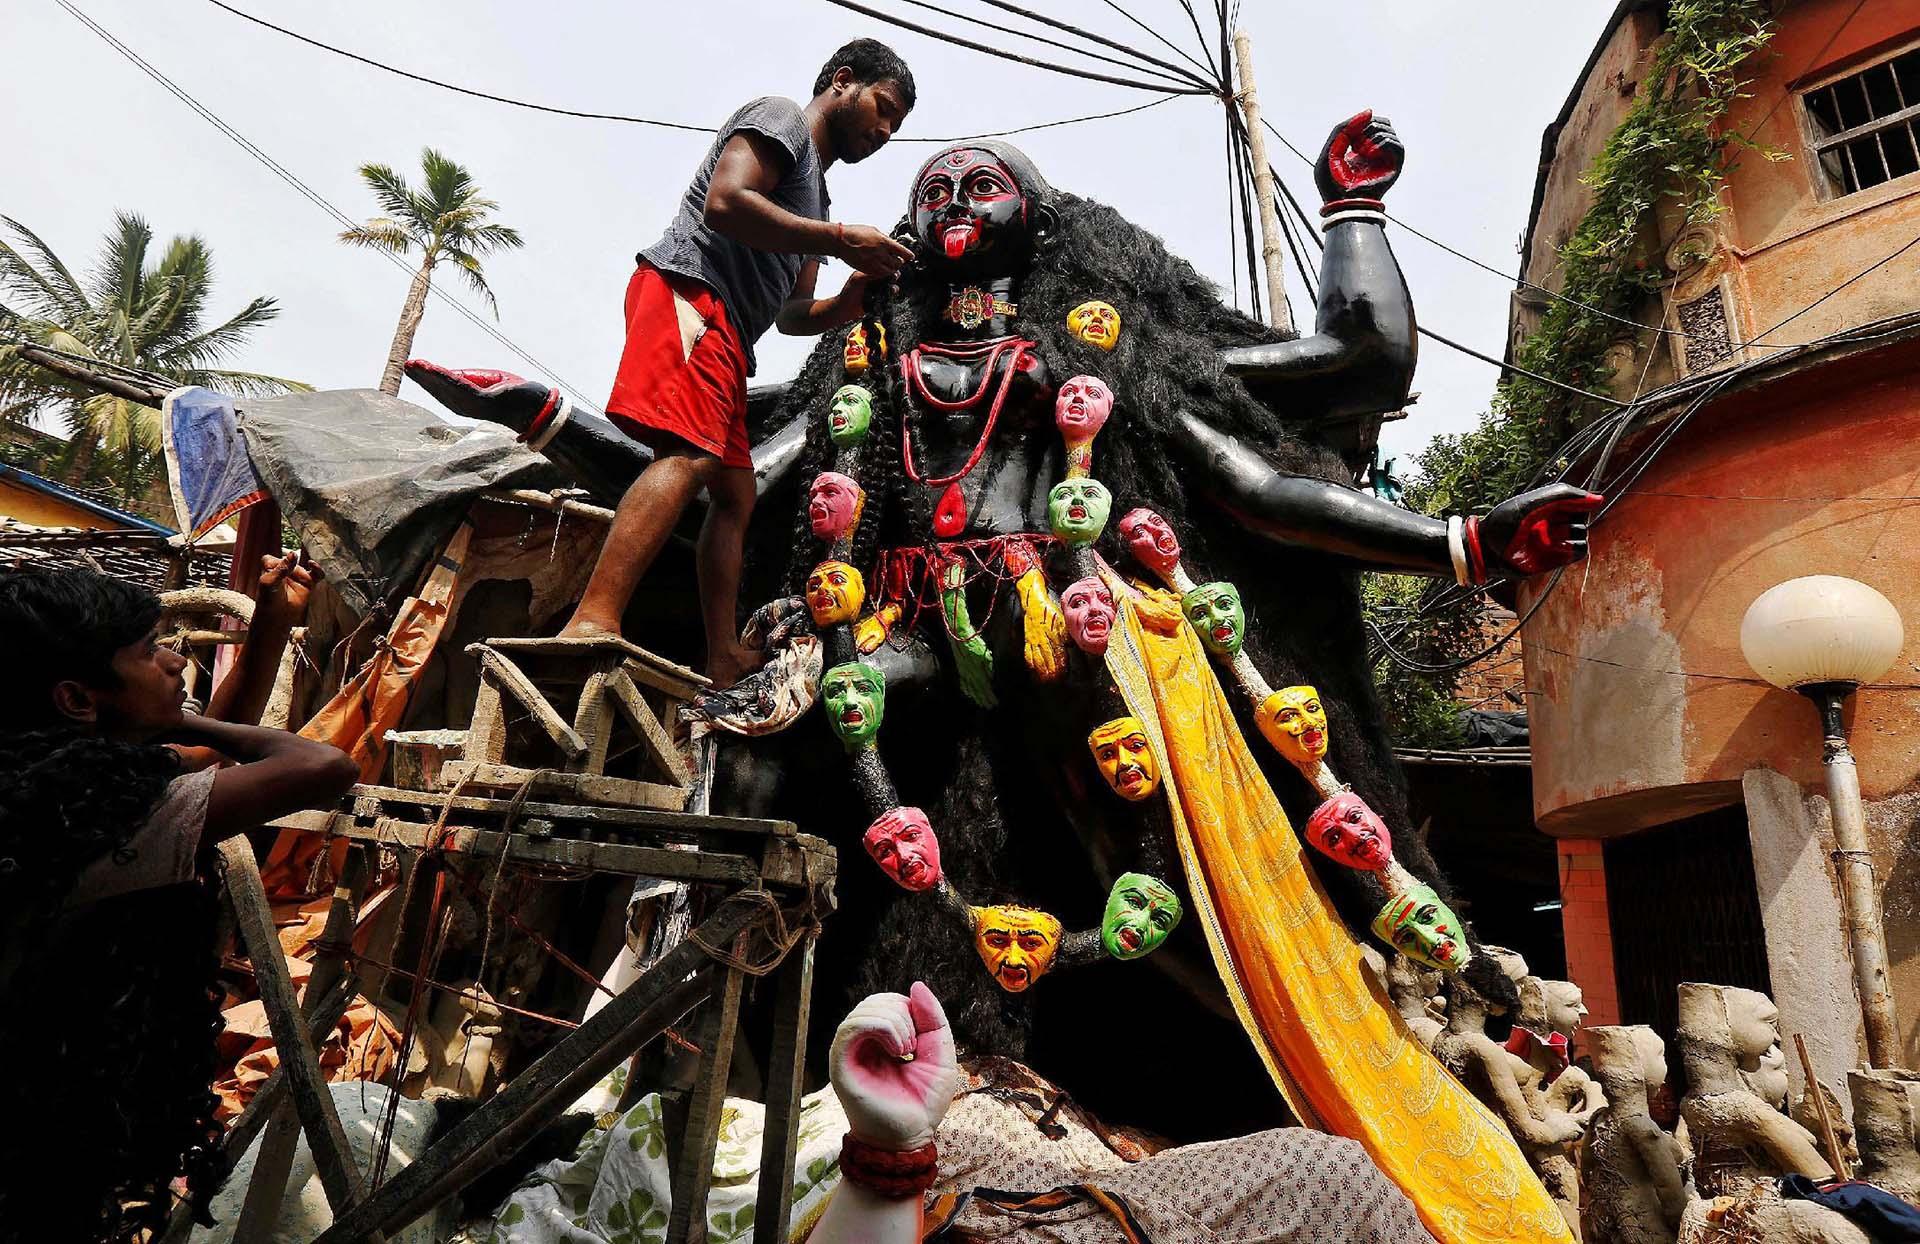 Un artista pone el pelo artificial en una figura de la diosa hindú Kali, antes del festival de Kali Puja en Kolkata